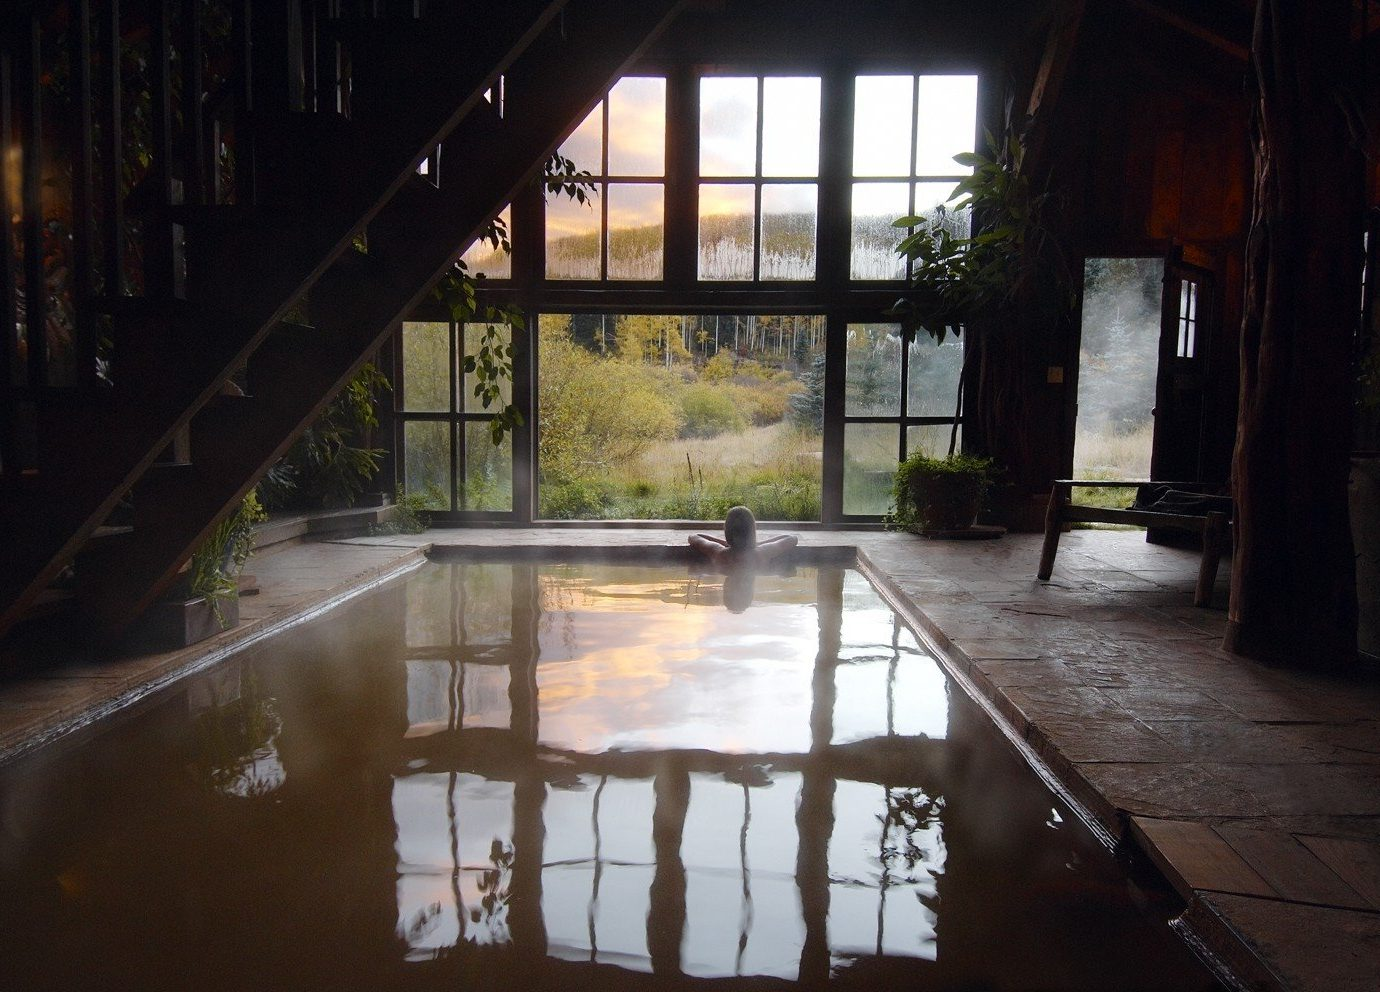 Hotels floor indoor house estate home backyard Courtyard sunlight reflection outdoor structure